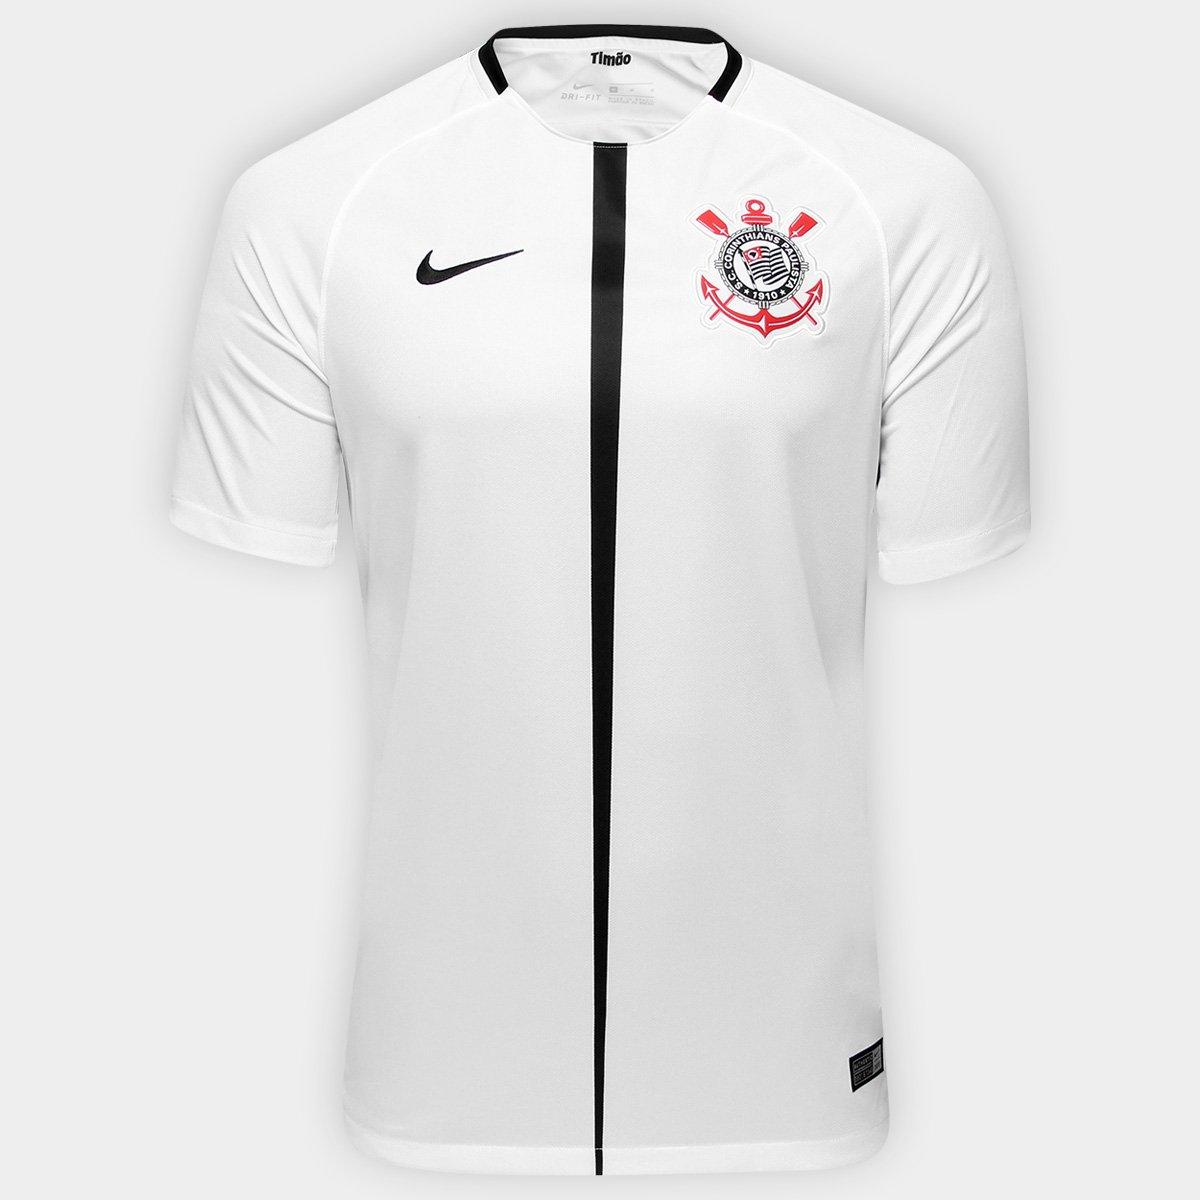 ... Camisa Corinthians I 17 18 nº 22 Mateus Vital - Torcedor Nike Masculina 669fafaeb7893